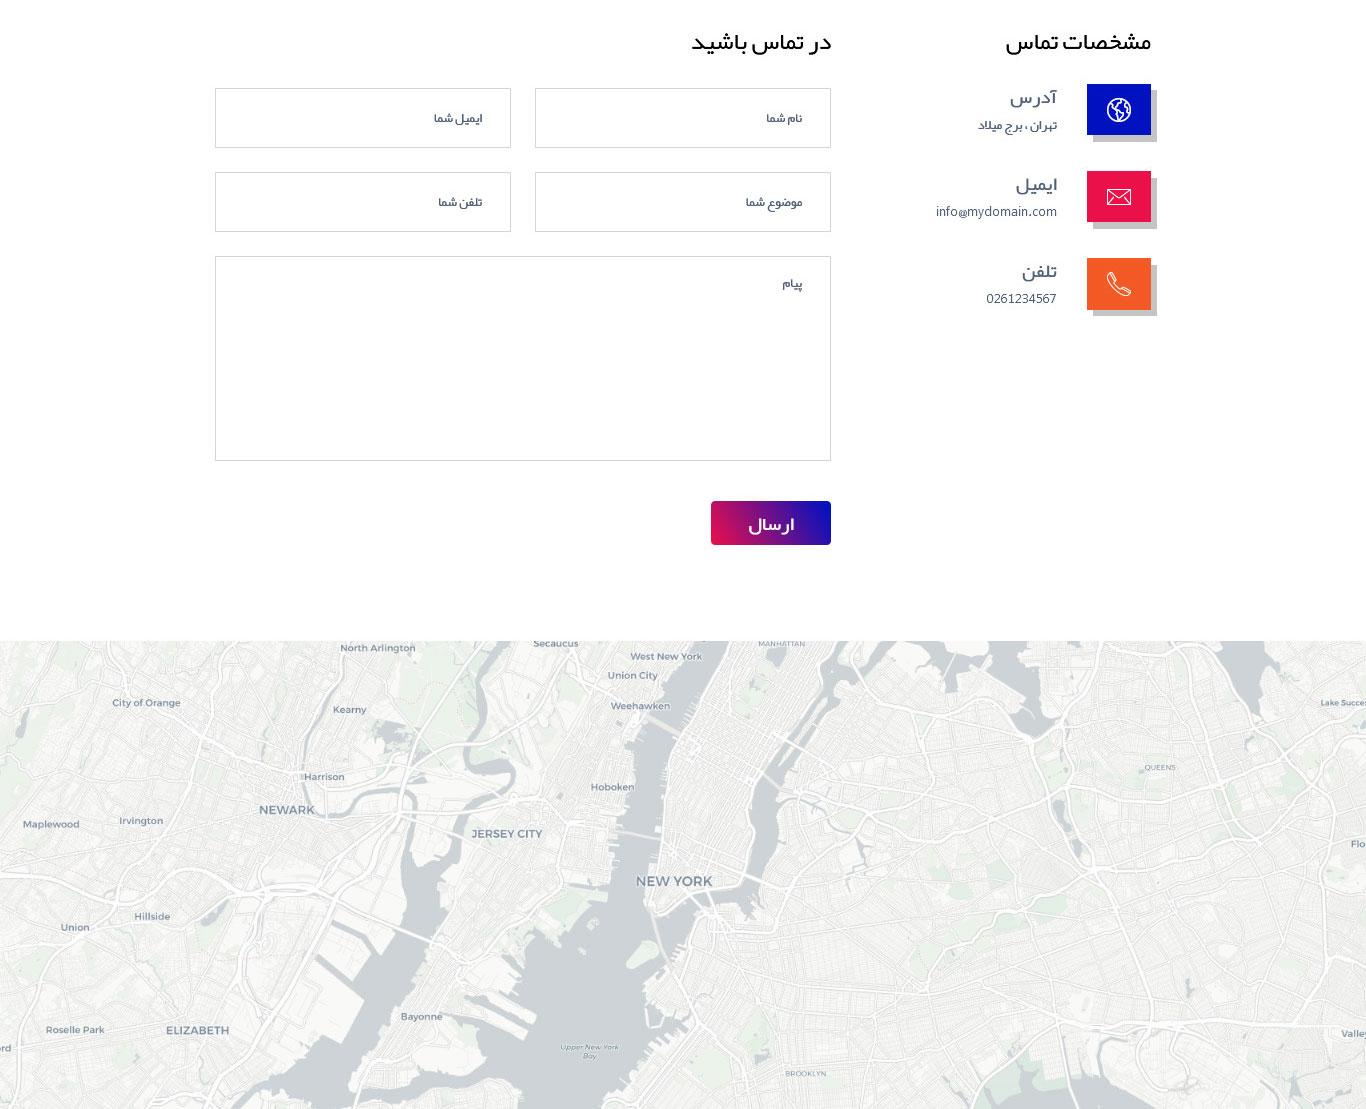 قالب معرفی اپلیکیشن ایکس شاپ